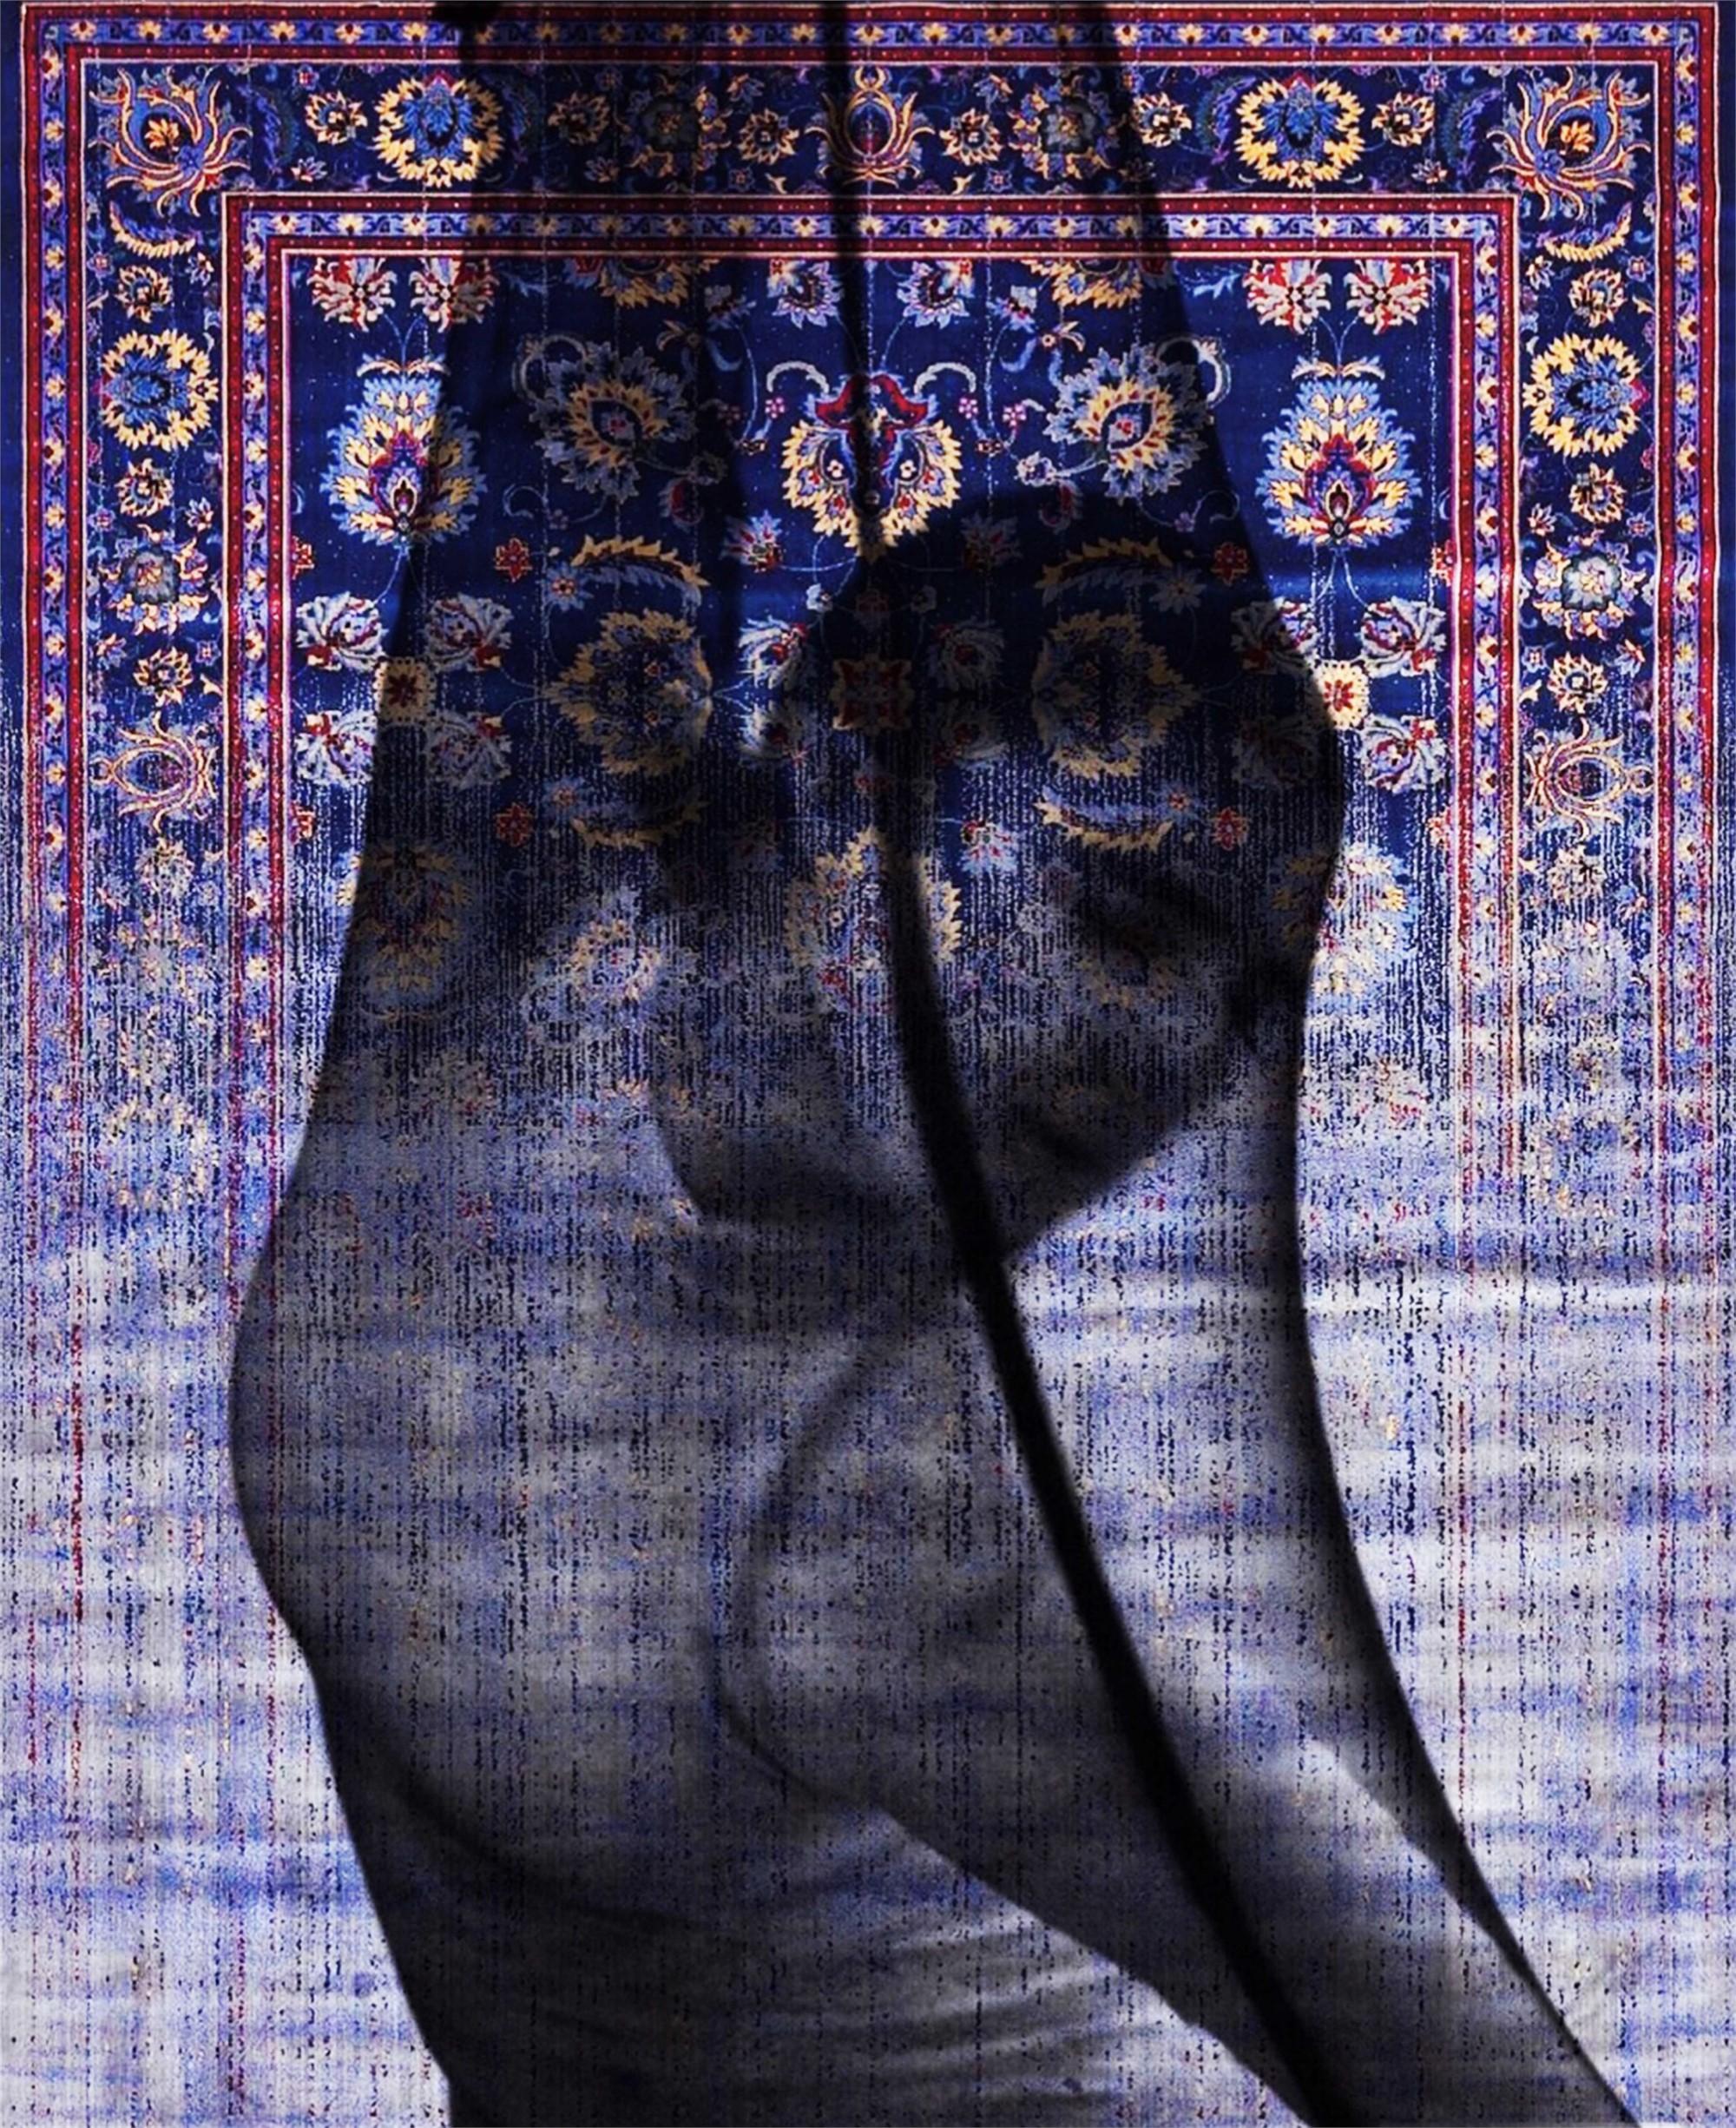 Xenia by Qinza Najm